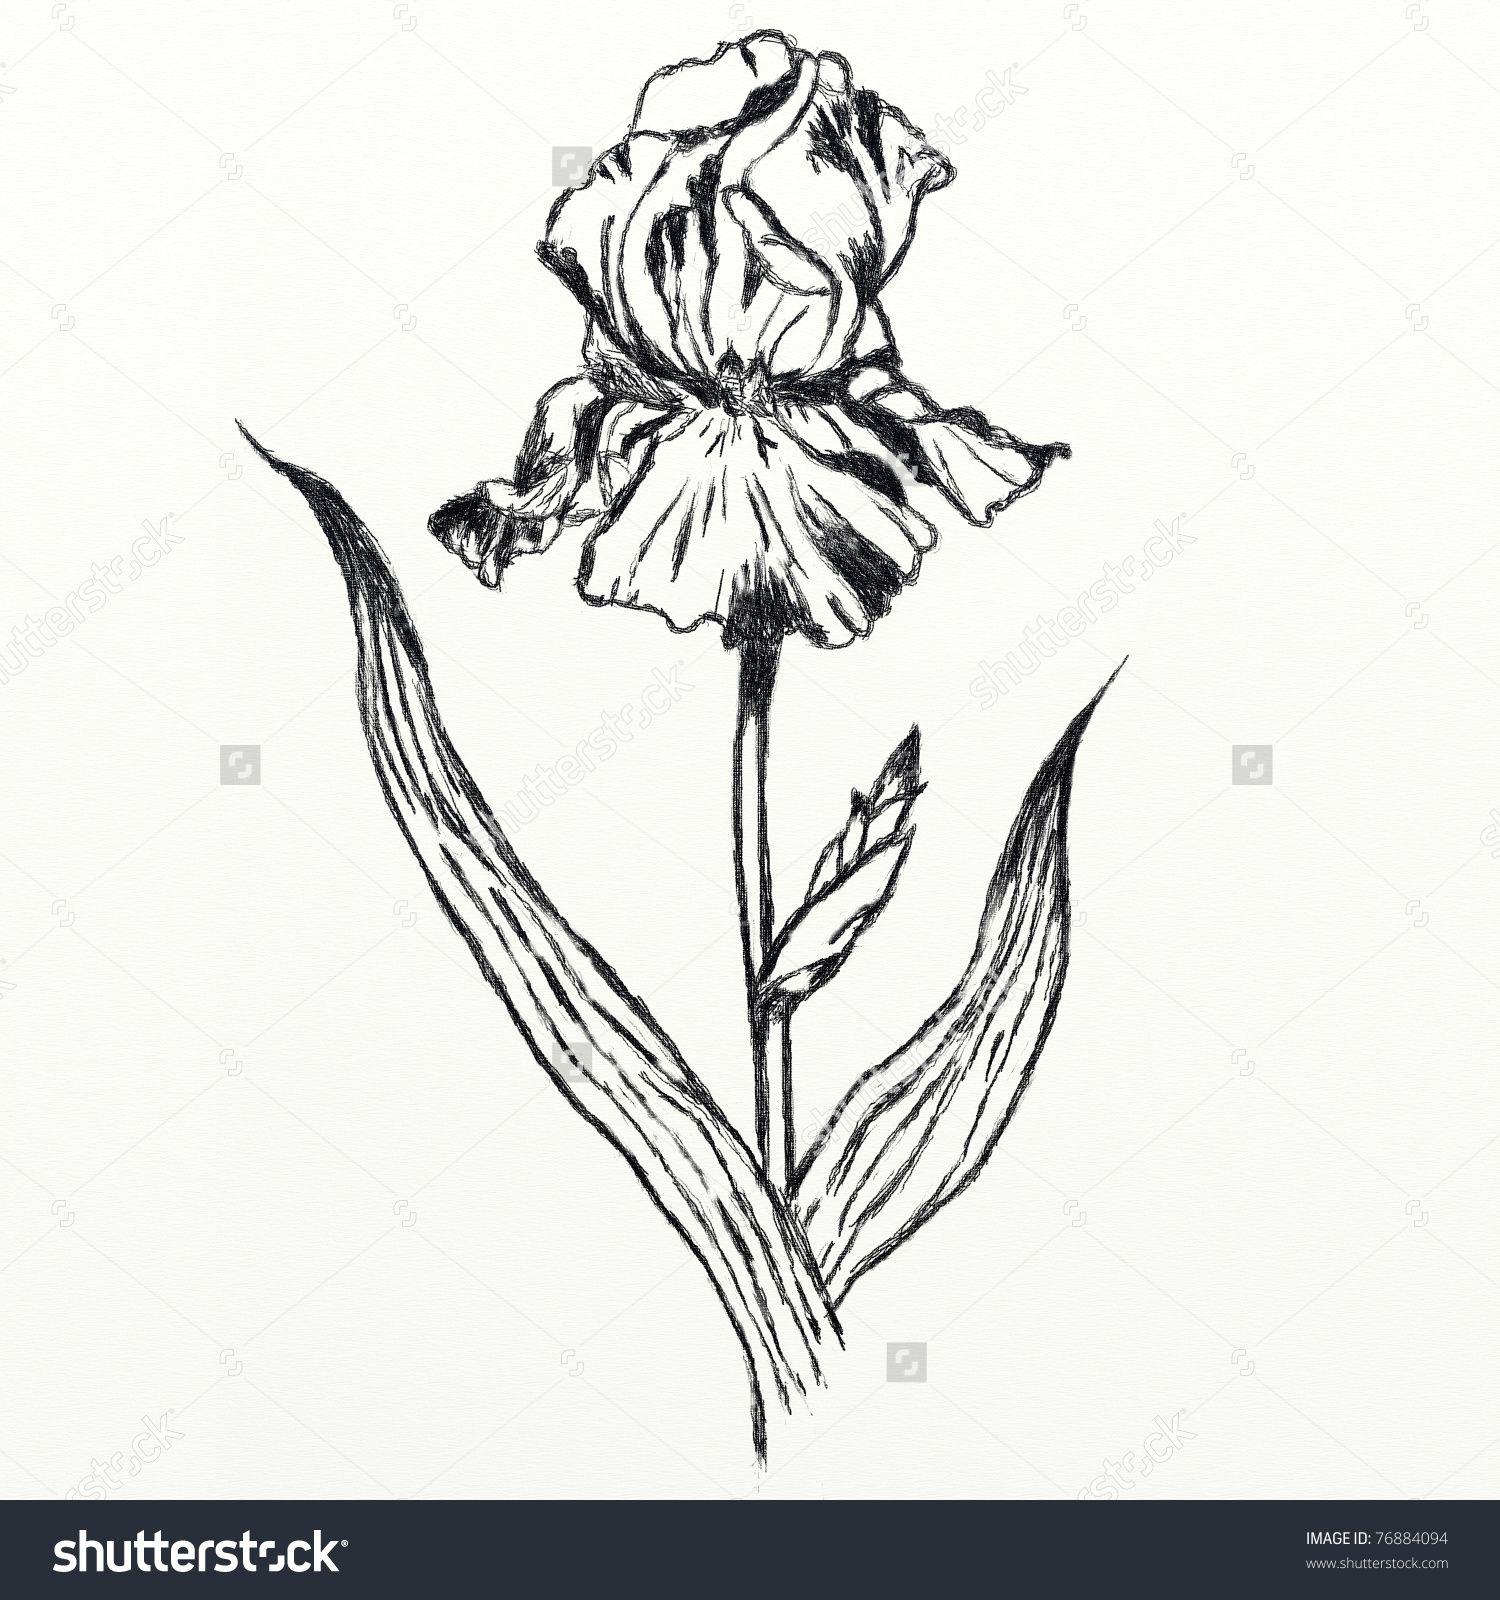 Iris Drawing Drawing Iris Flower Realistic Sketch Stock Illustration Iris Drawing Flower Sketch Images Drawings